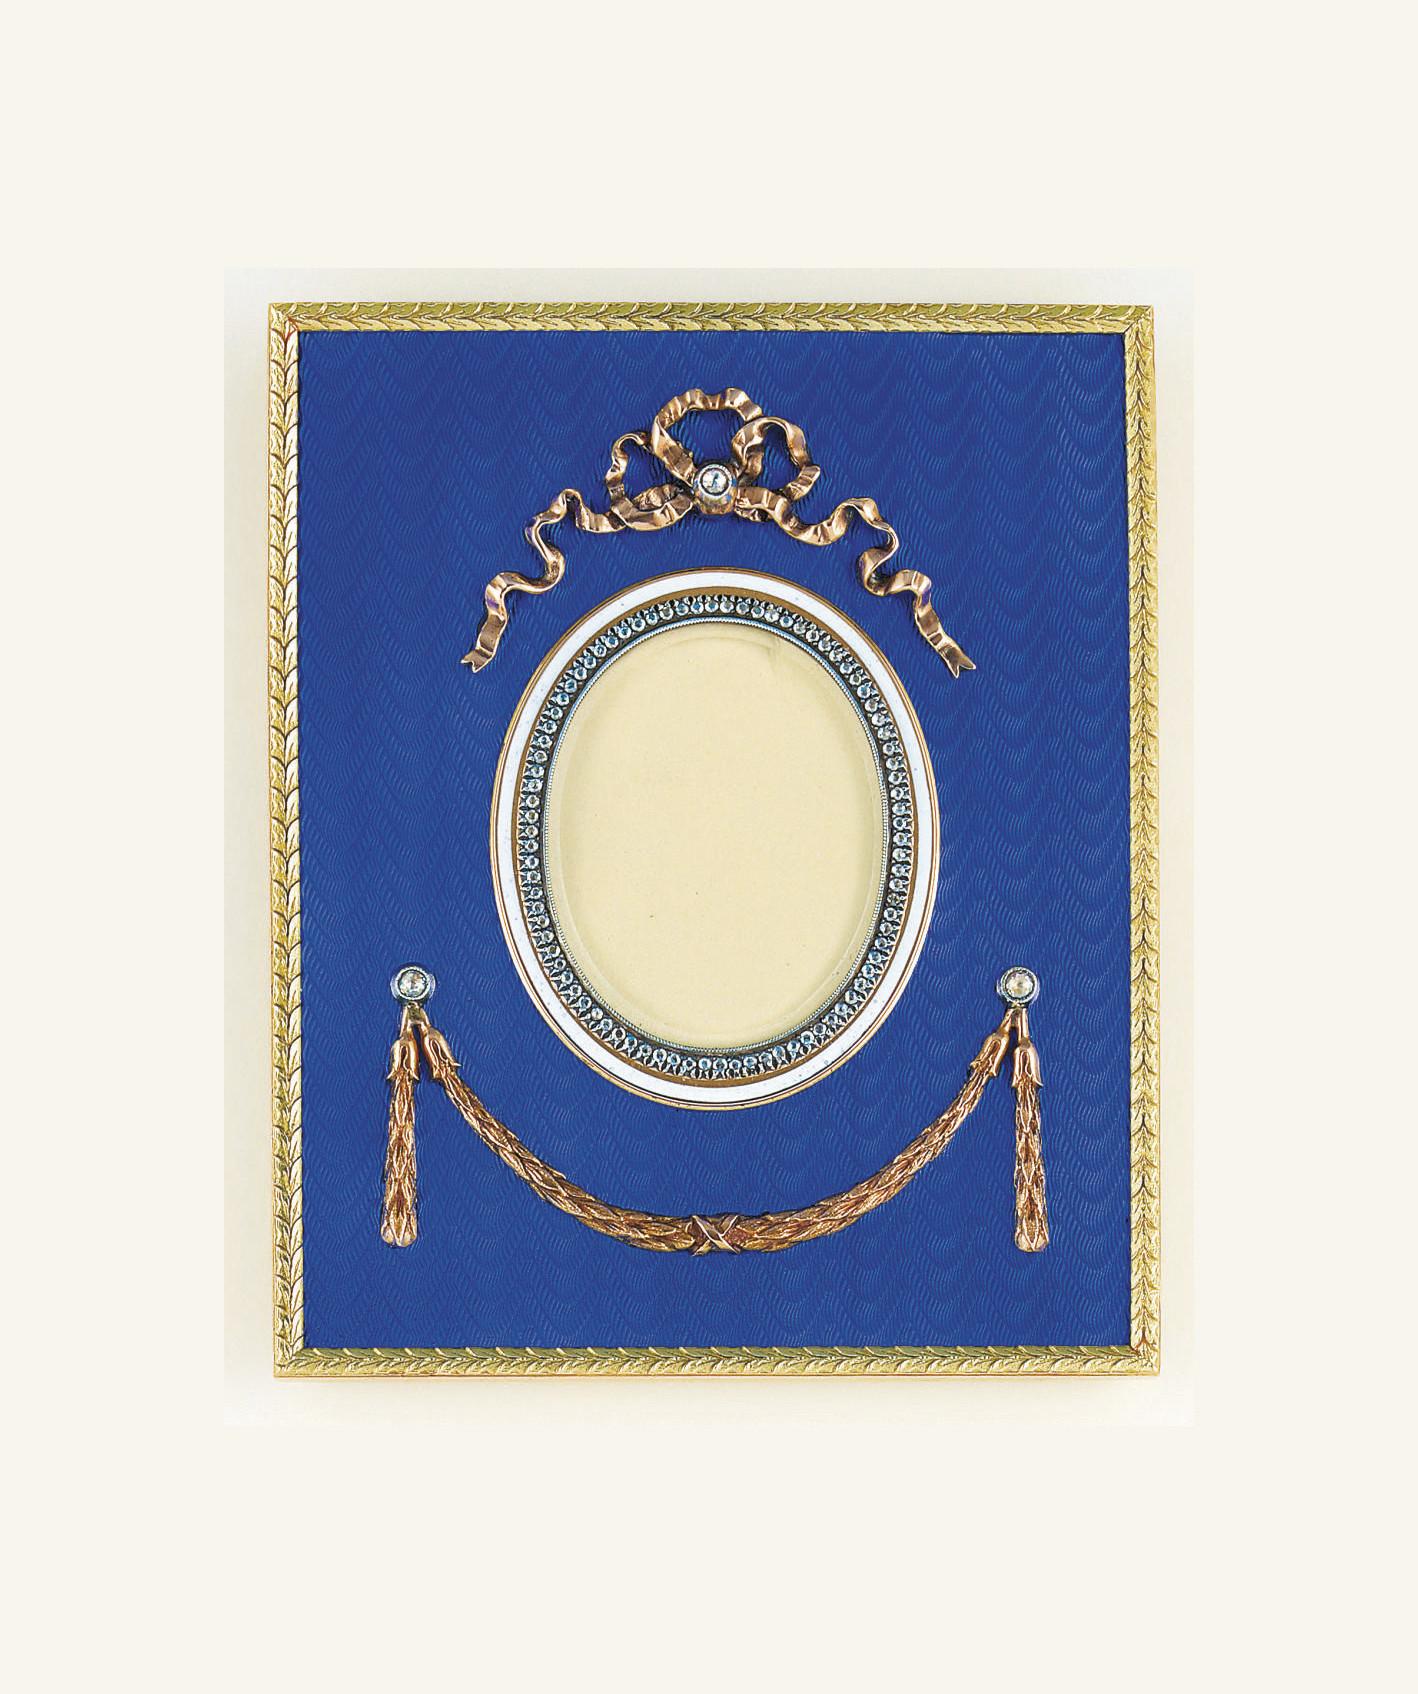 An enamel and diamond photogra